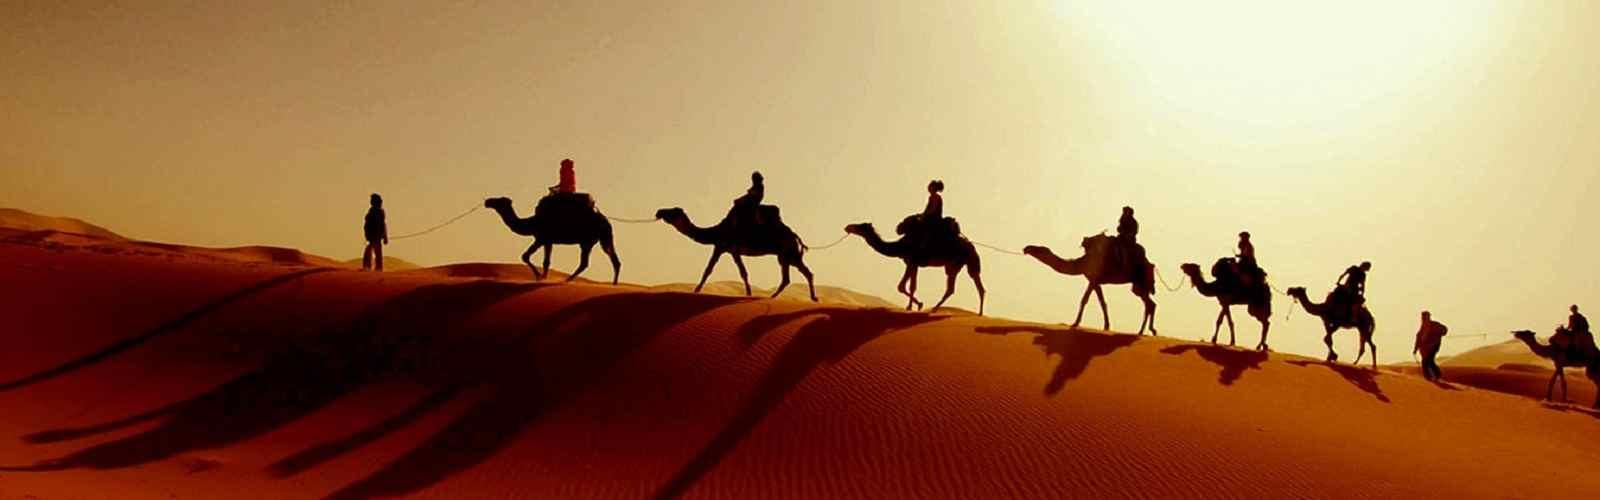 Vip Desert Safari Premier Company Dubai Top Seller Desert Safari 2017